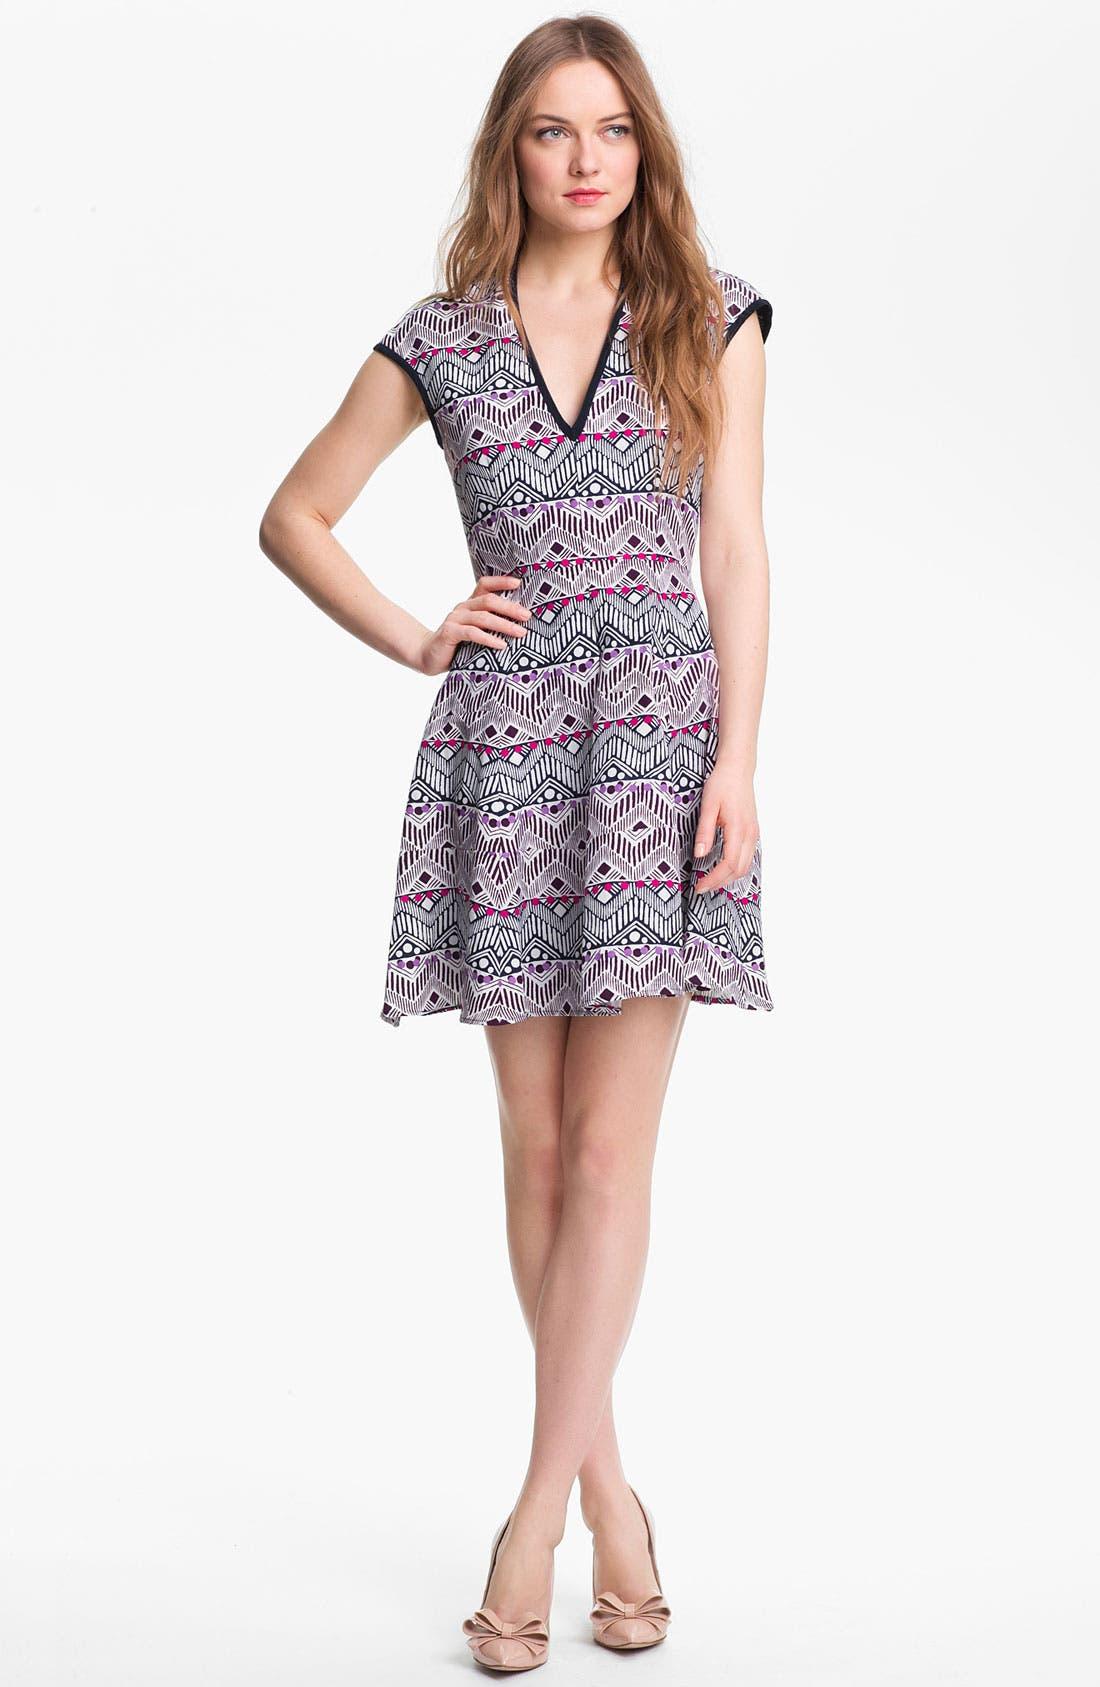 Alternate Image 1 Selected - Nanette Lepore 'Deep Cove' Silk Blend Fit & Flare Dress